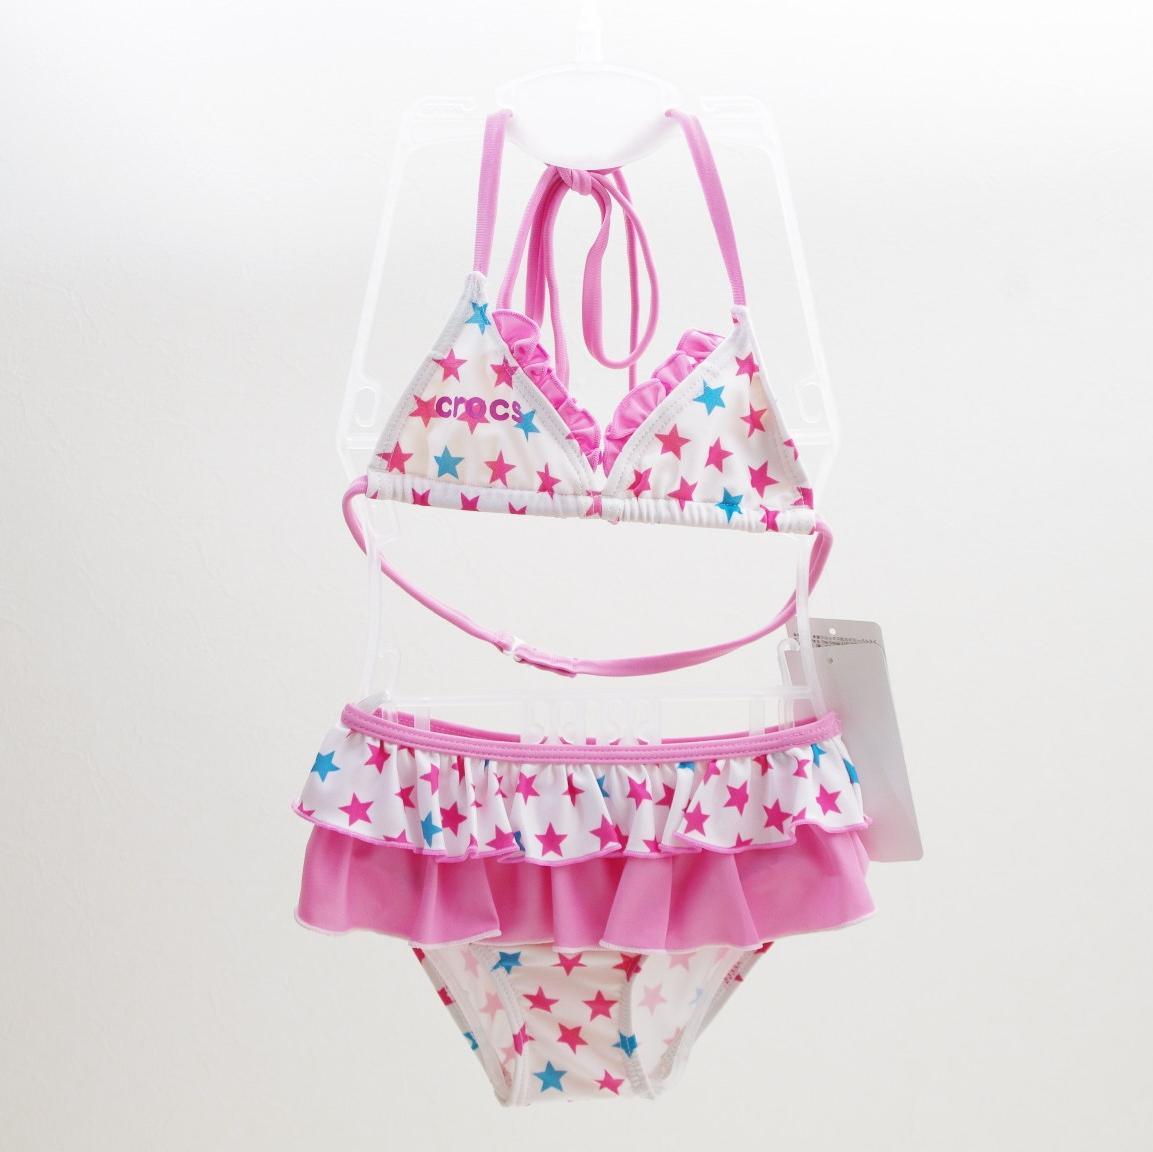 crocs クロックス 女児 セパレート水着  ピンク星 110cm 163-752